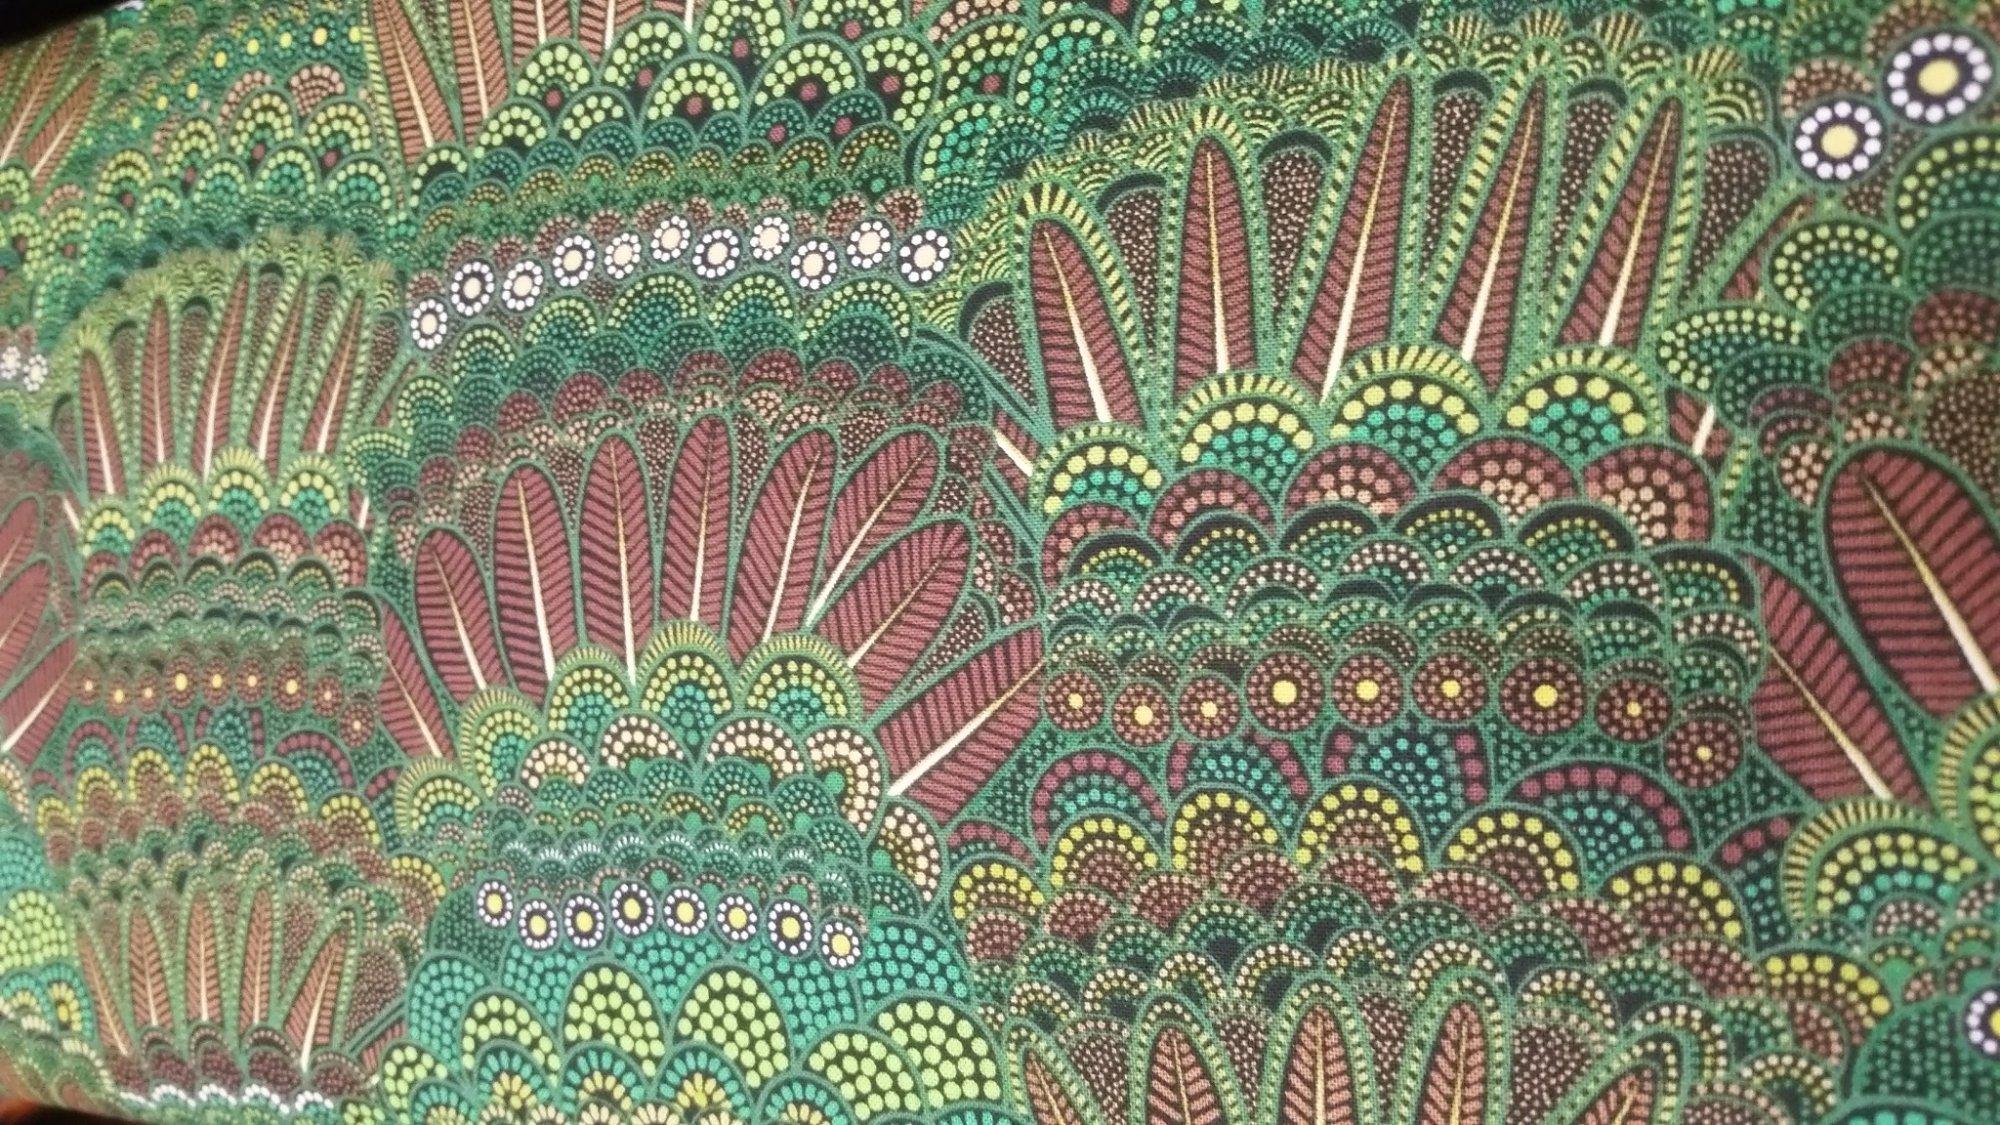 Fabri-Quilt : Paint Brush Studio 120-13482 Goanna Walkabout